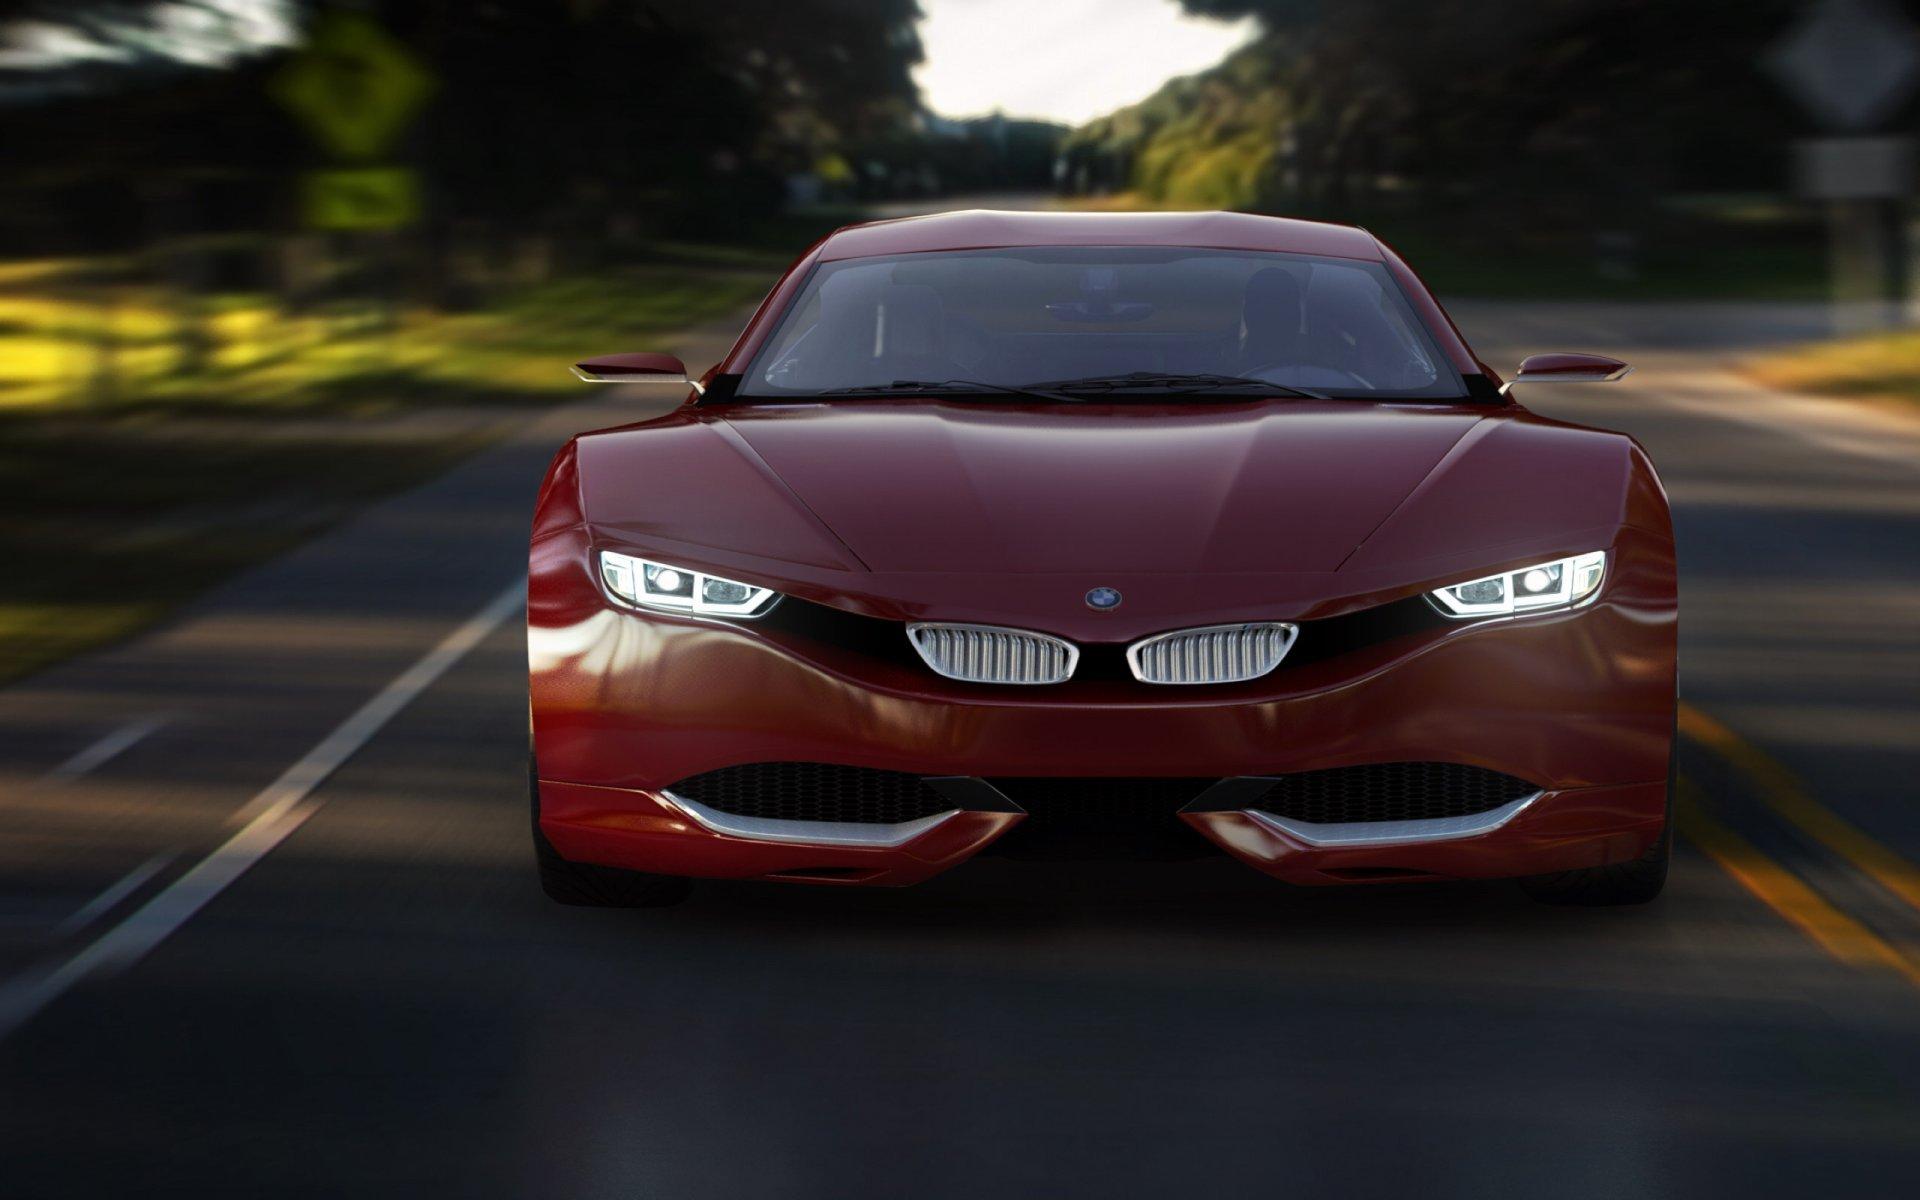 BMW M9 HD Wallpapers 1920x1200 hd Car wallpaper download 1920x1200